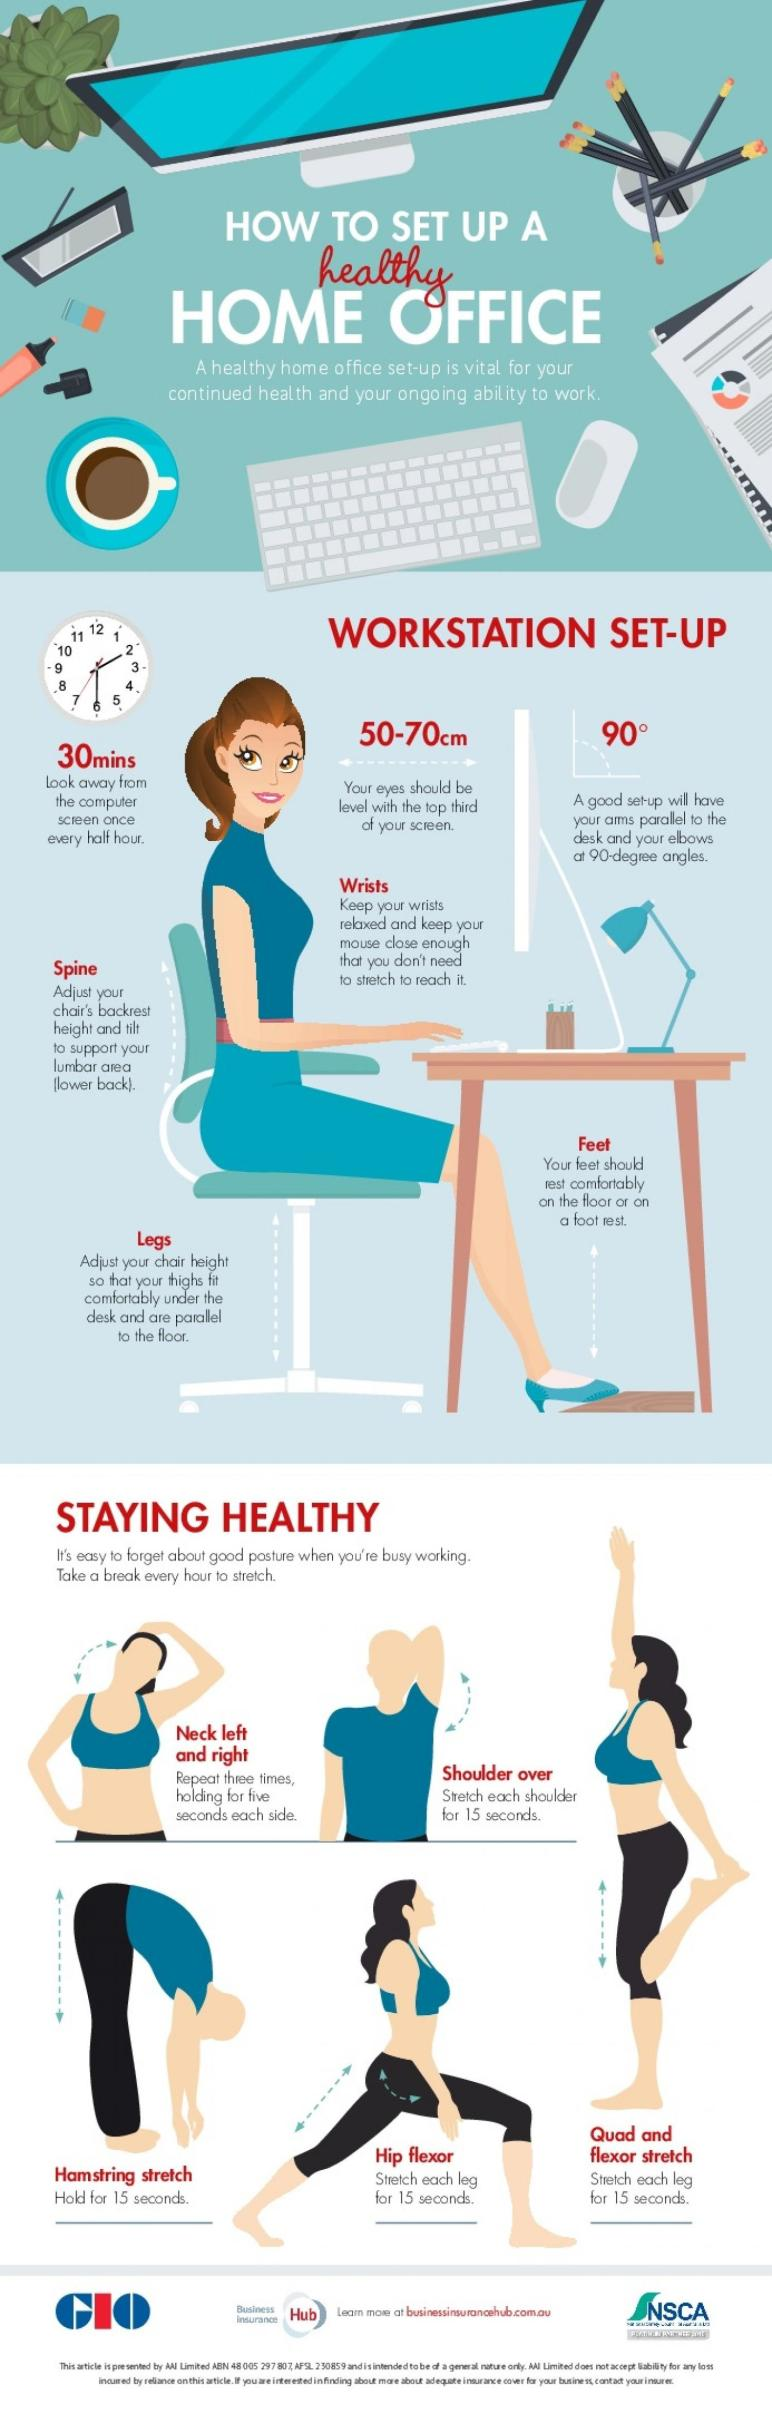 Setup Healthy Home Office Visual